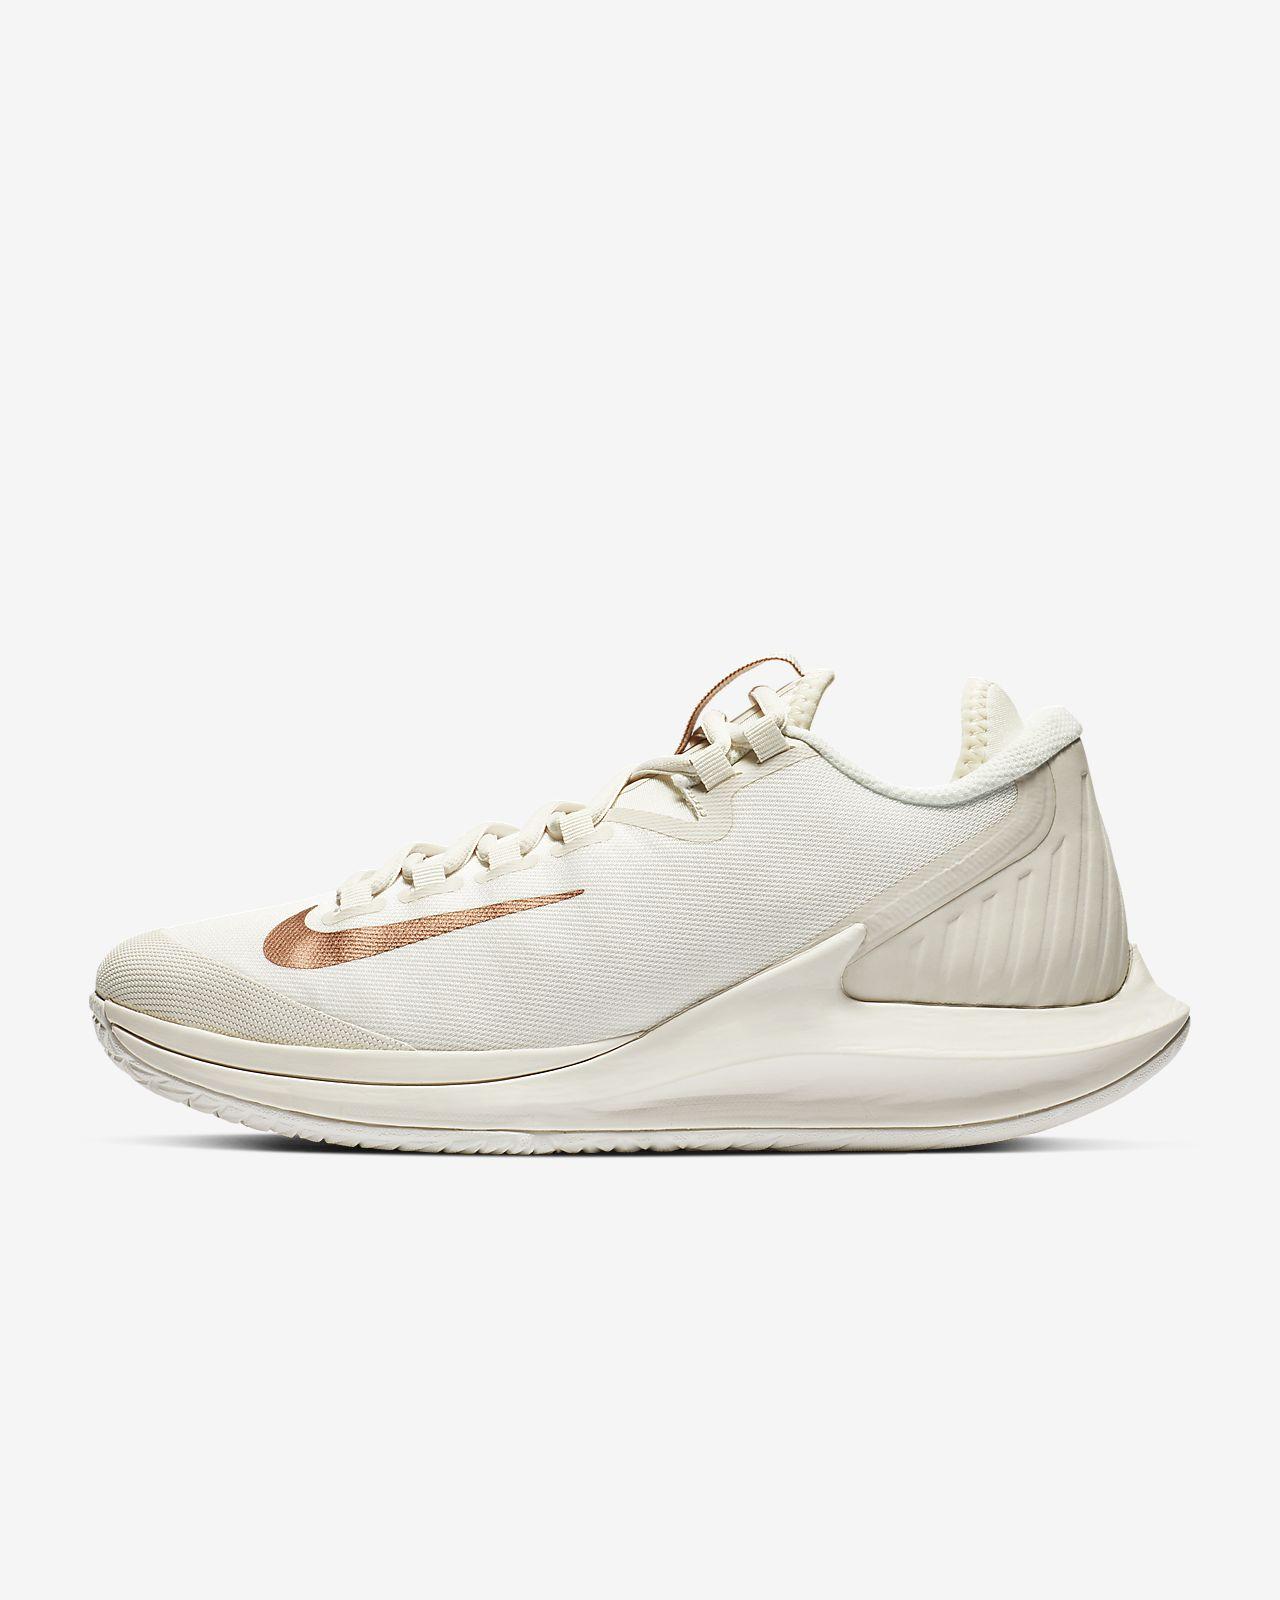 NikeCourt Air Zoom Zero Women's Hard Court Tennis Shoe